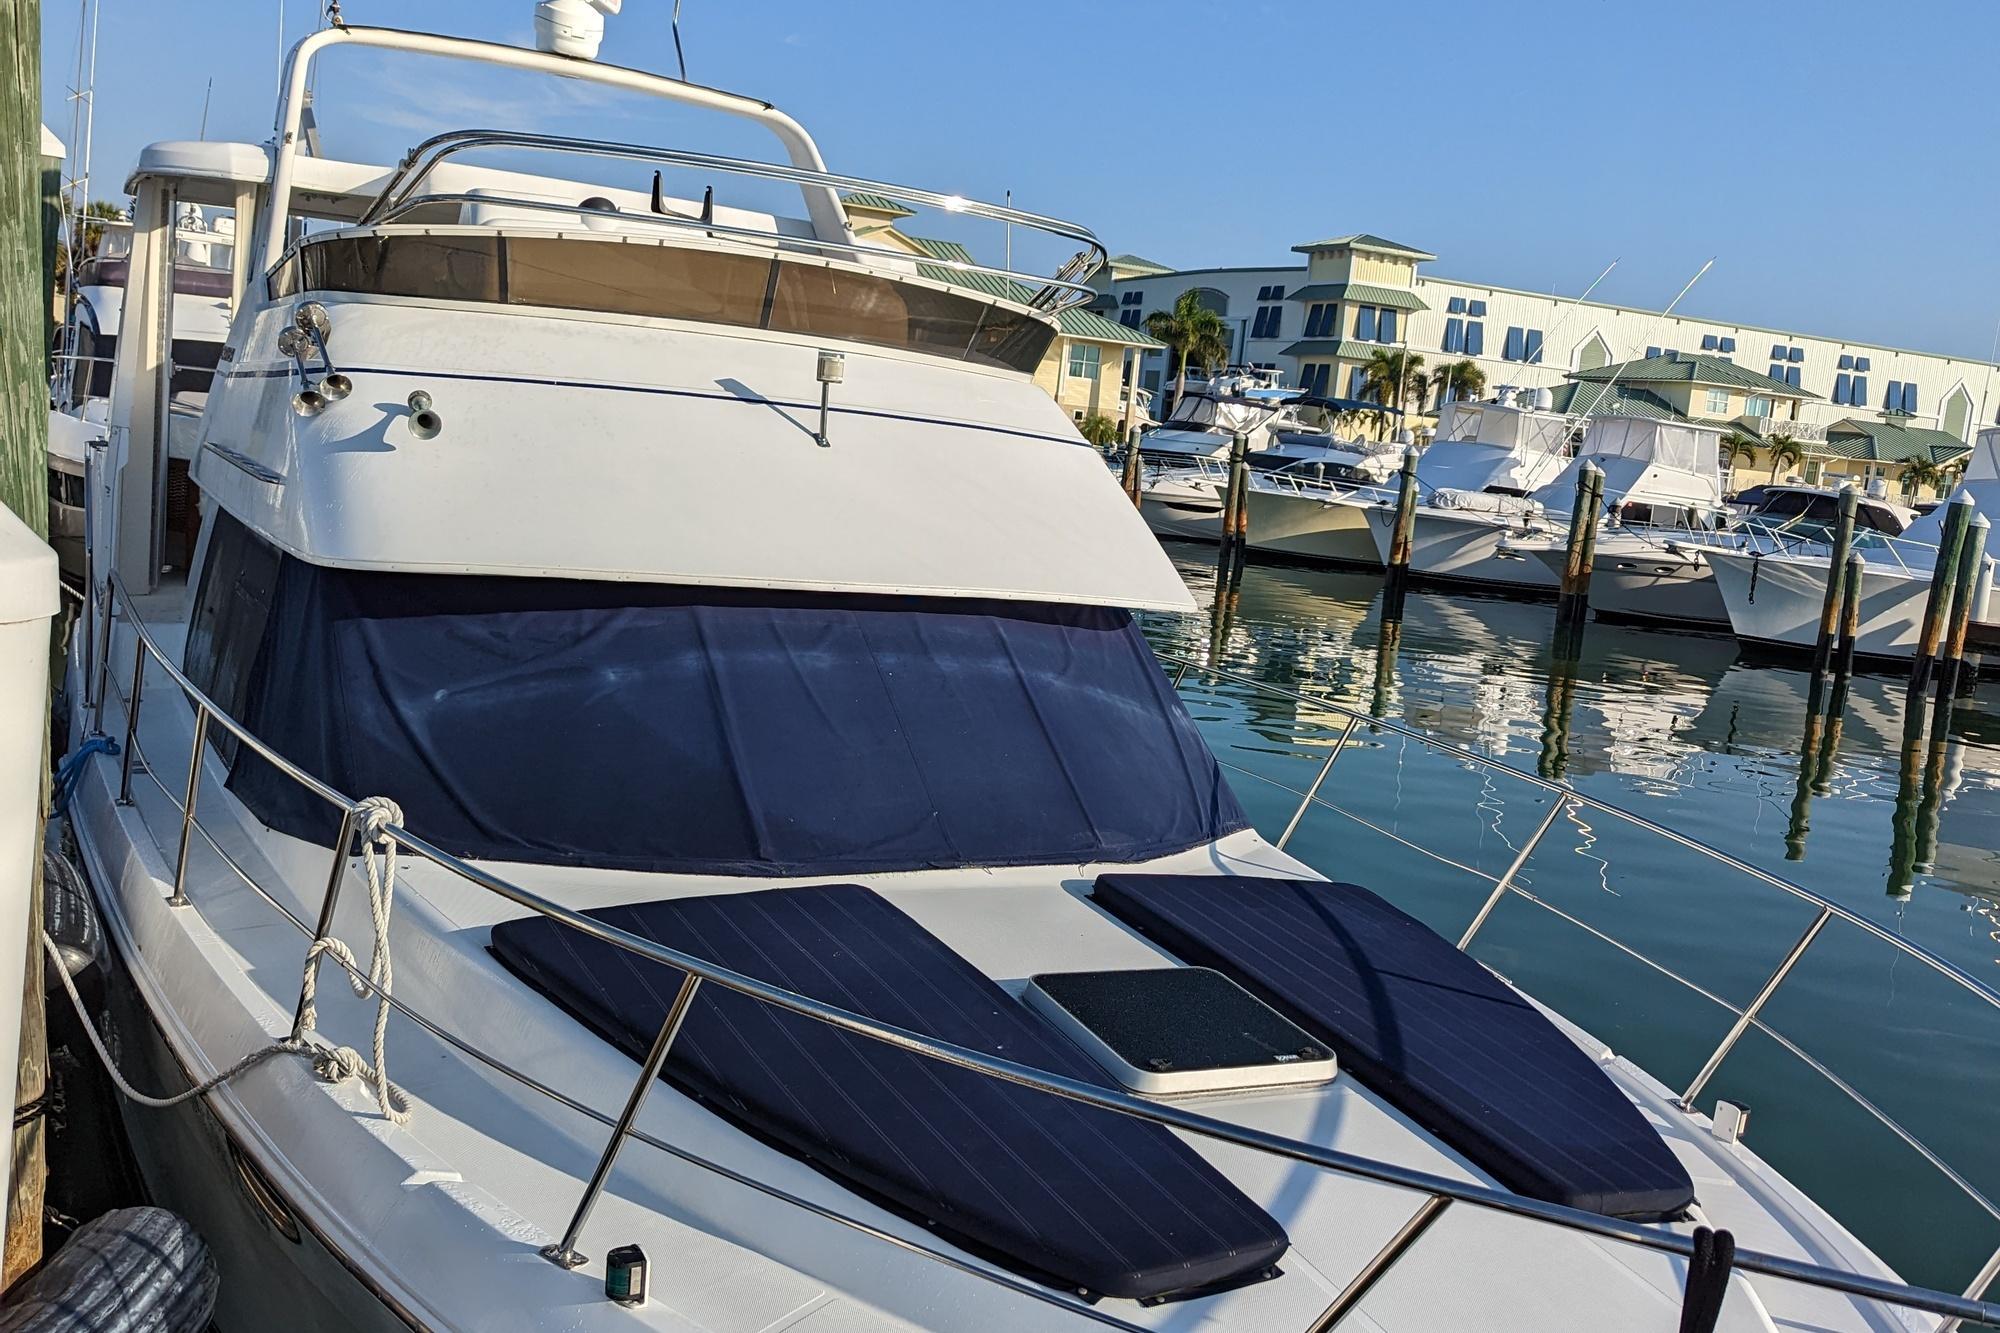 Caravelle Razor 258 Party Fish Boating World